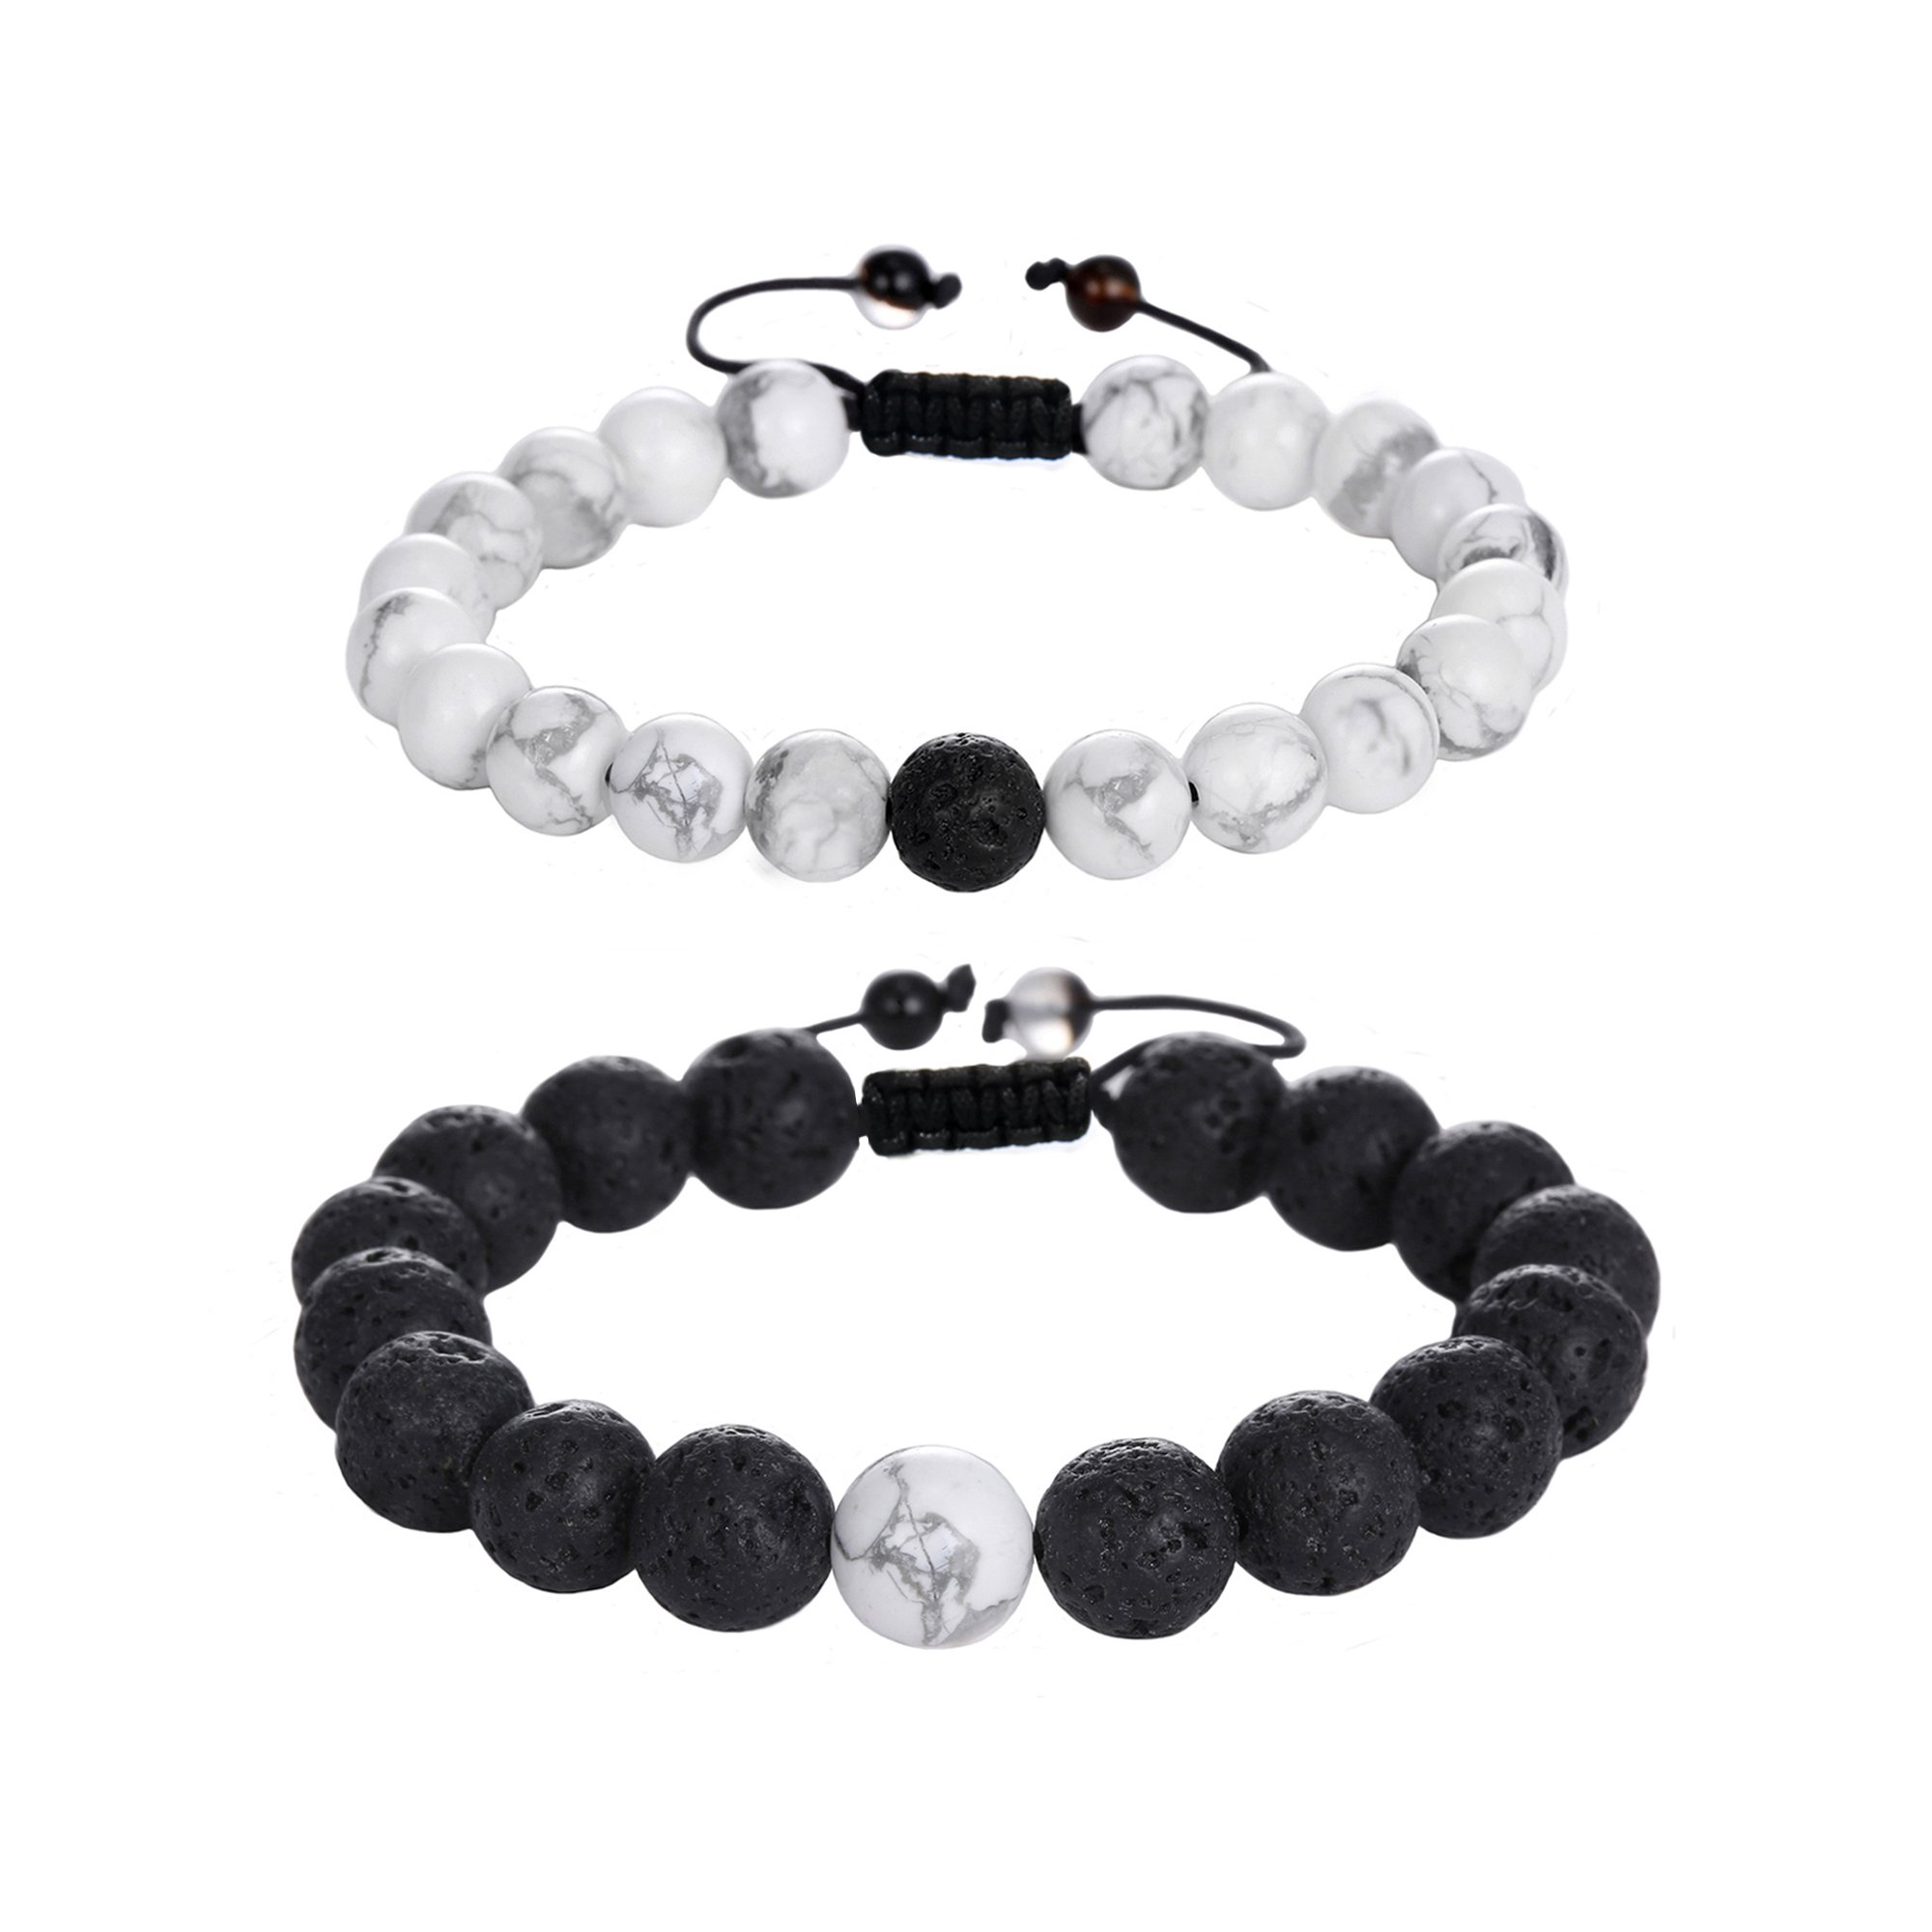 Jade cabbage Distance Relationship Bracelets for Couple-2pcs